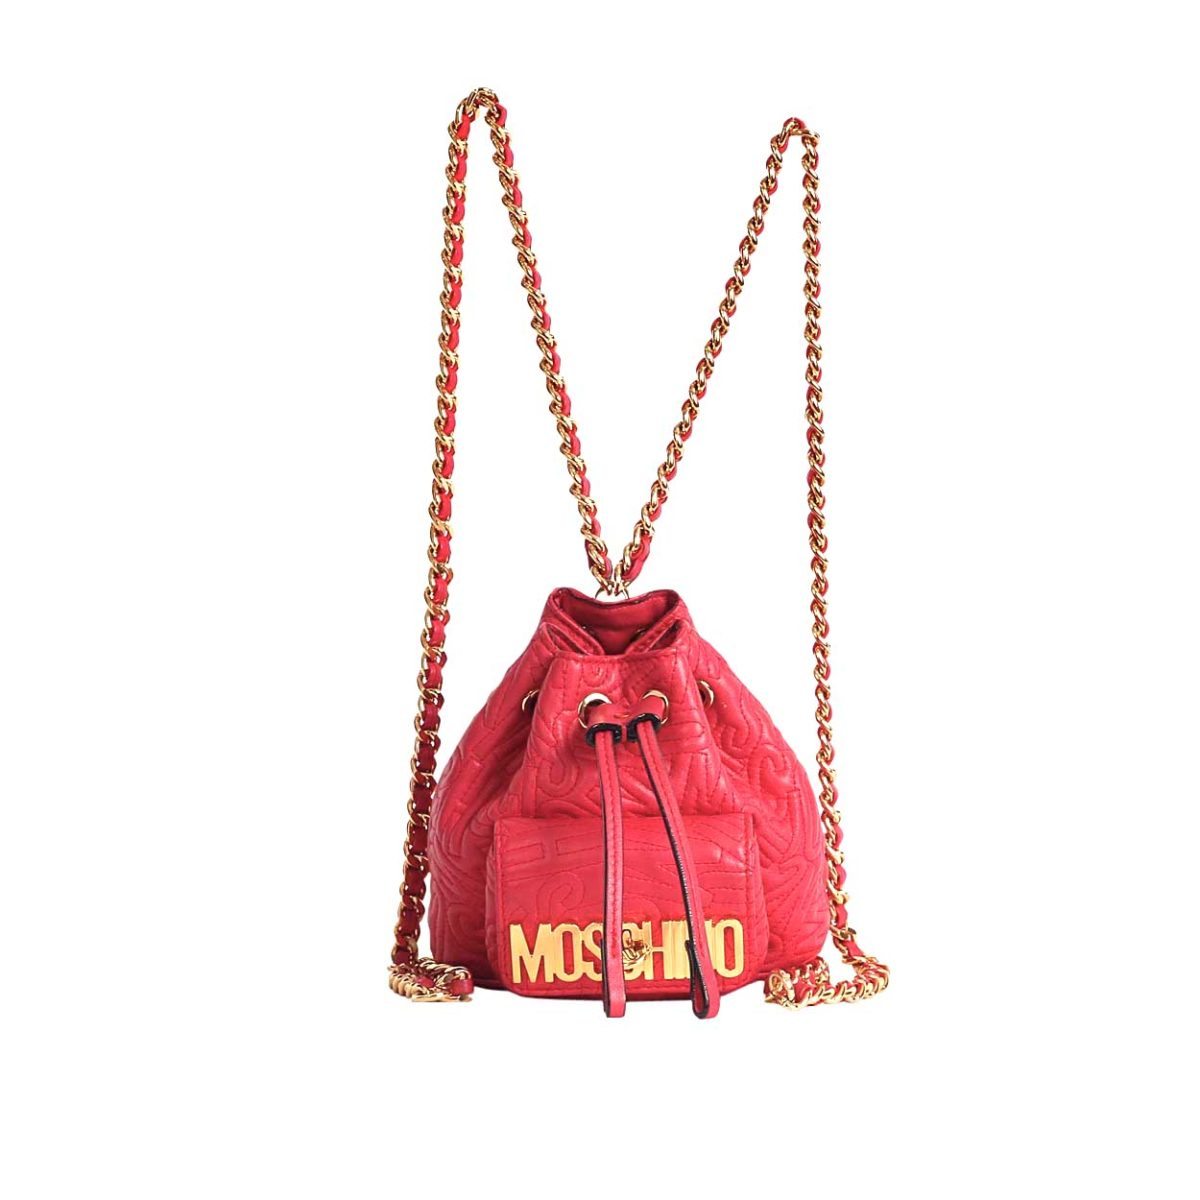 35177e0492015 MOSCHINO Mini Logo Bucket Backpack